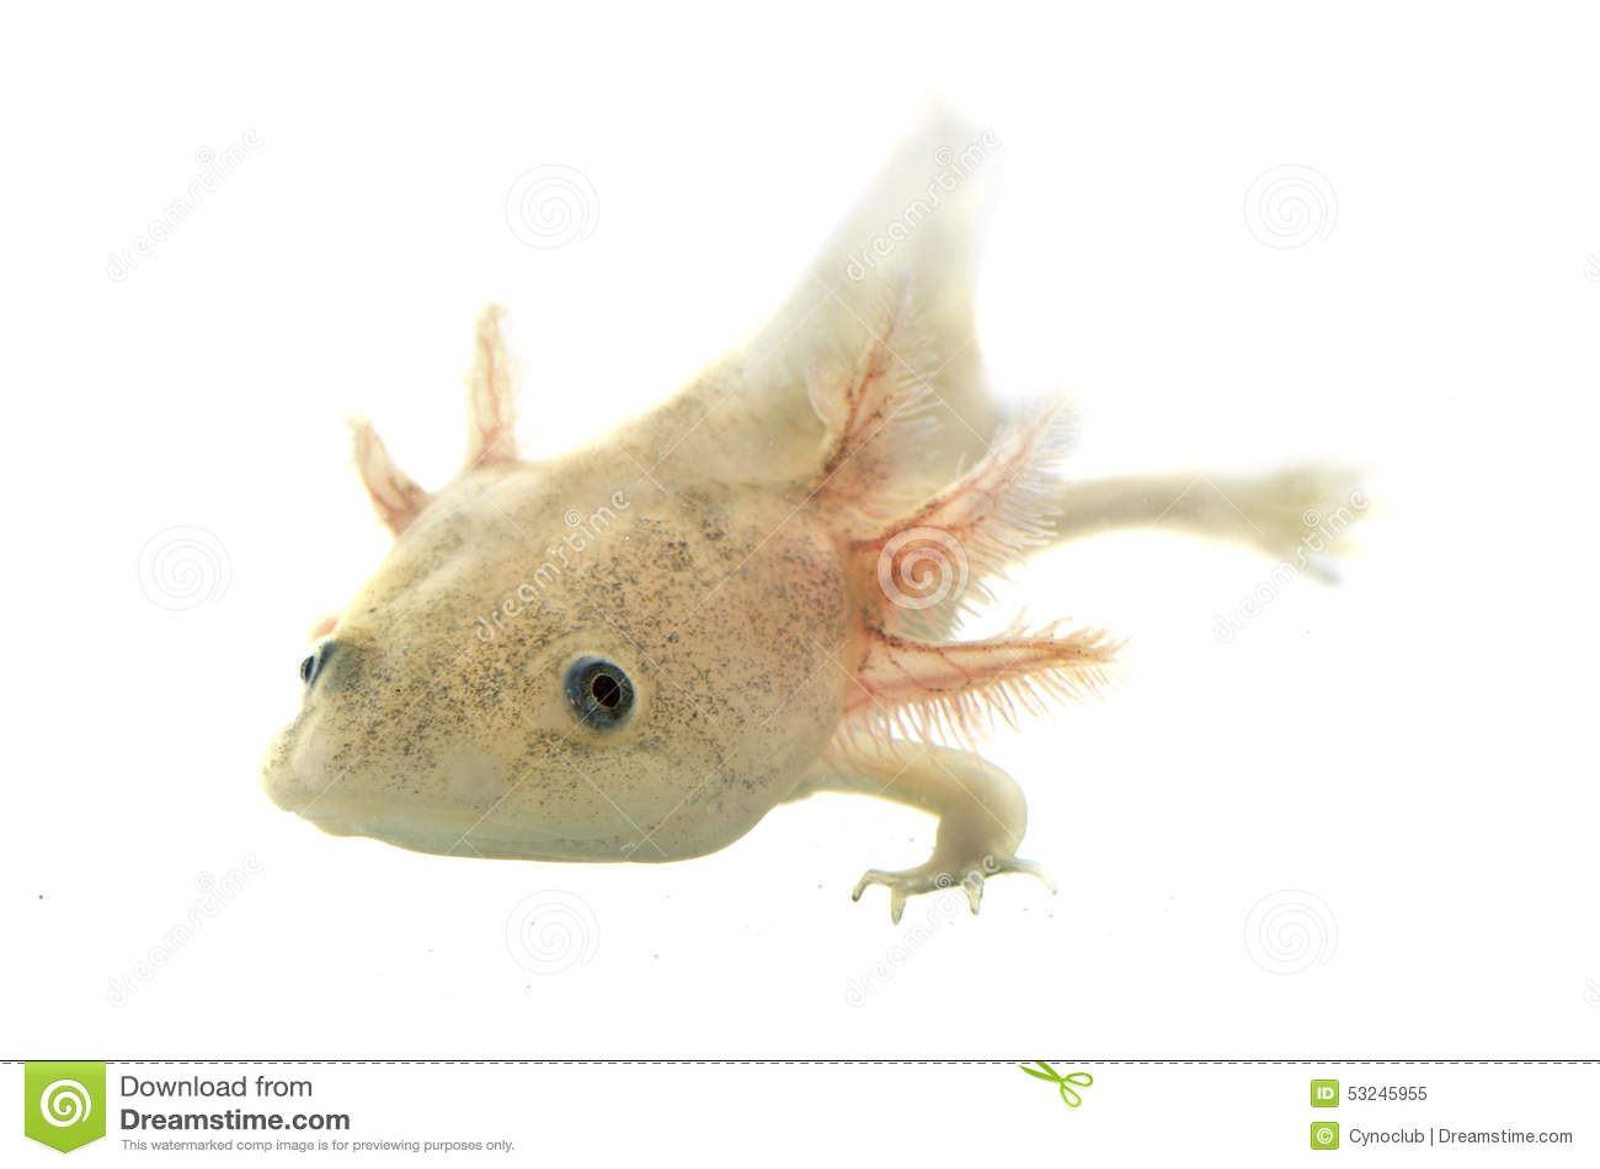 salamander white background - photo #32